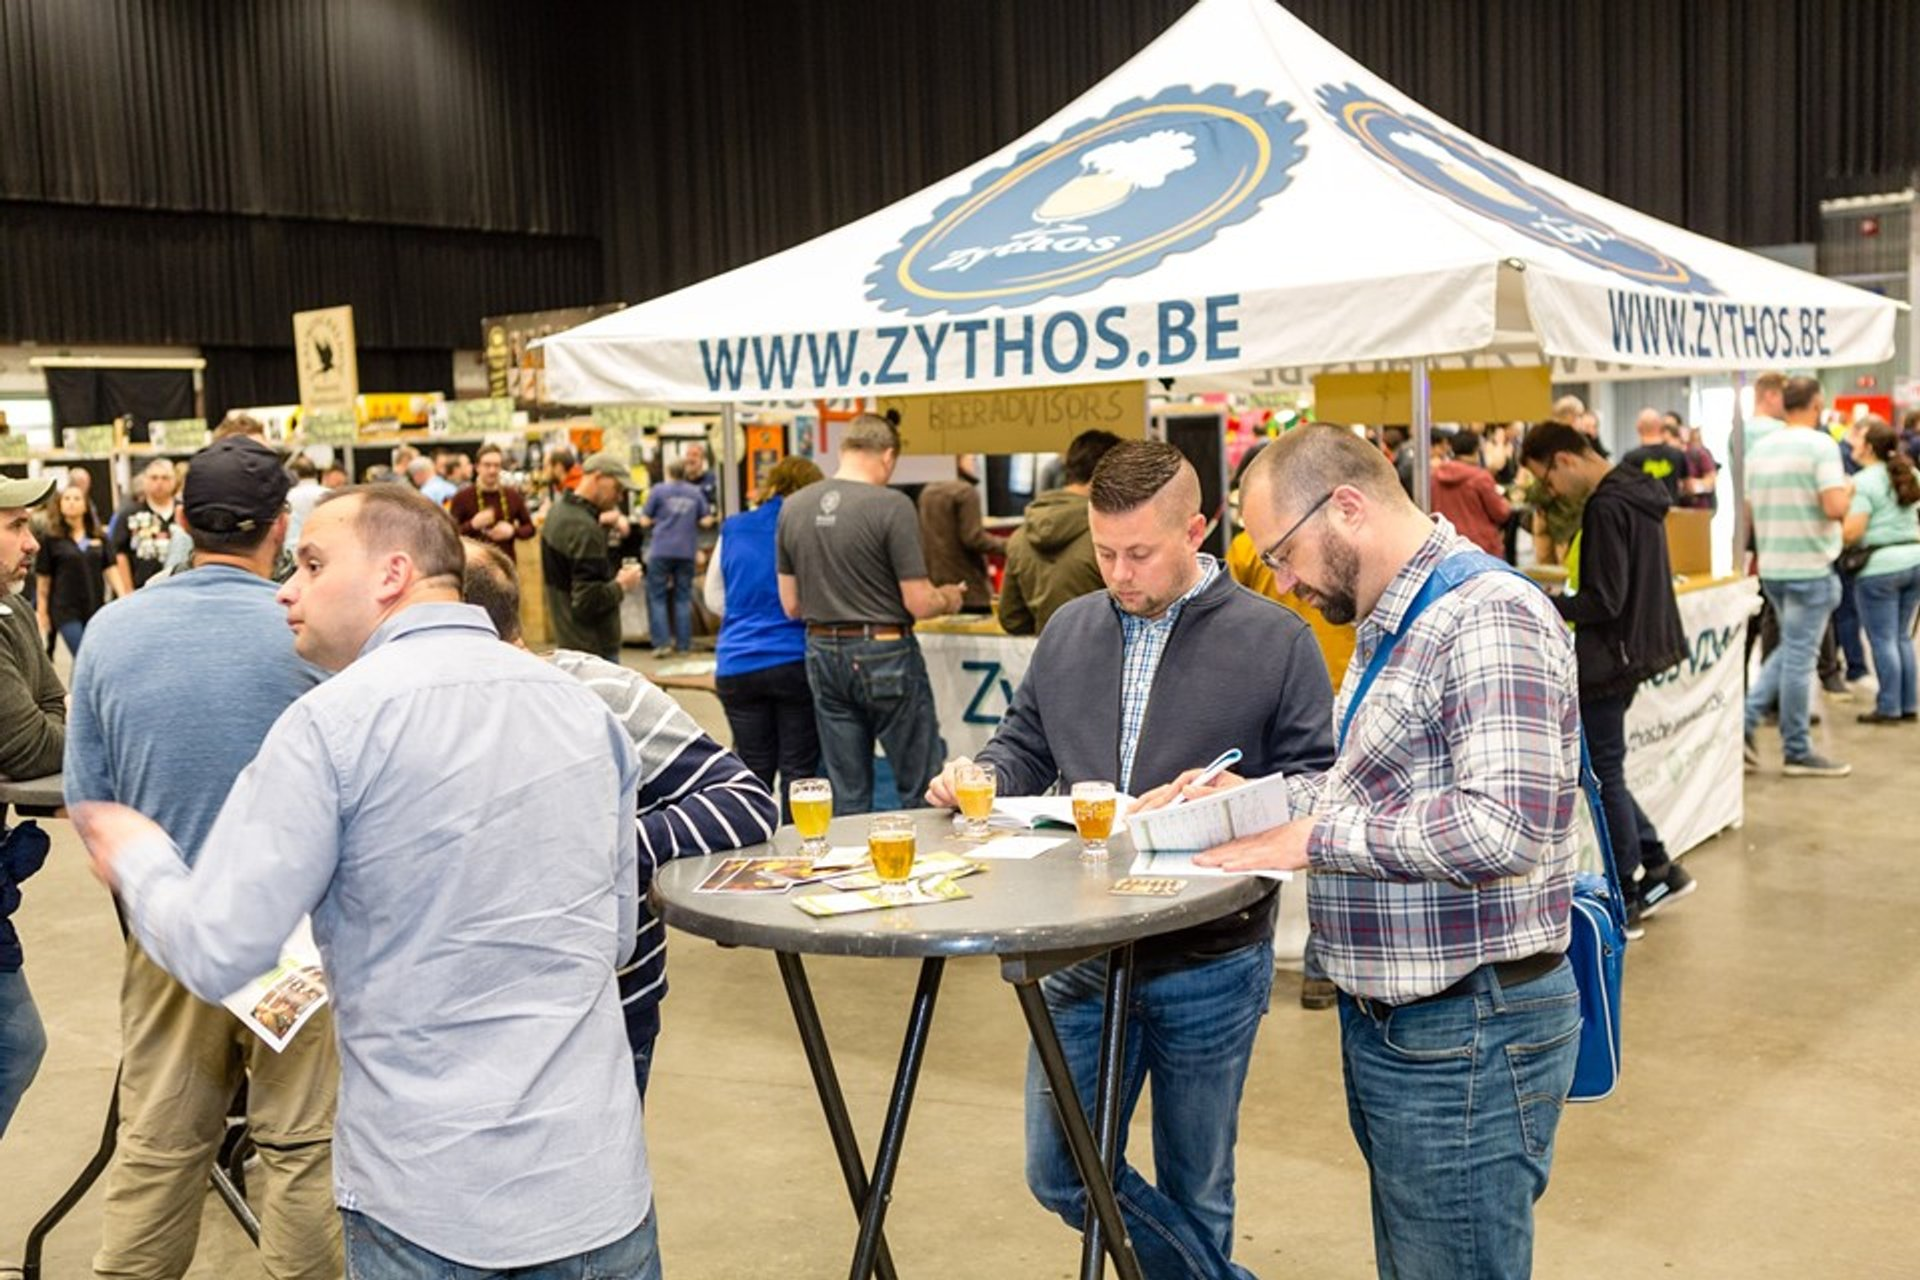 Beer Festival 2020.Zythos Beer Festival 2020 In Belgium Dates Map